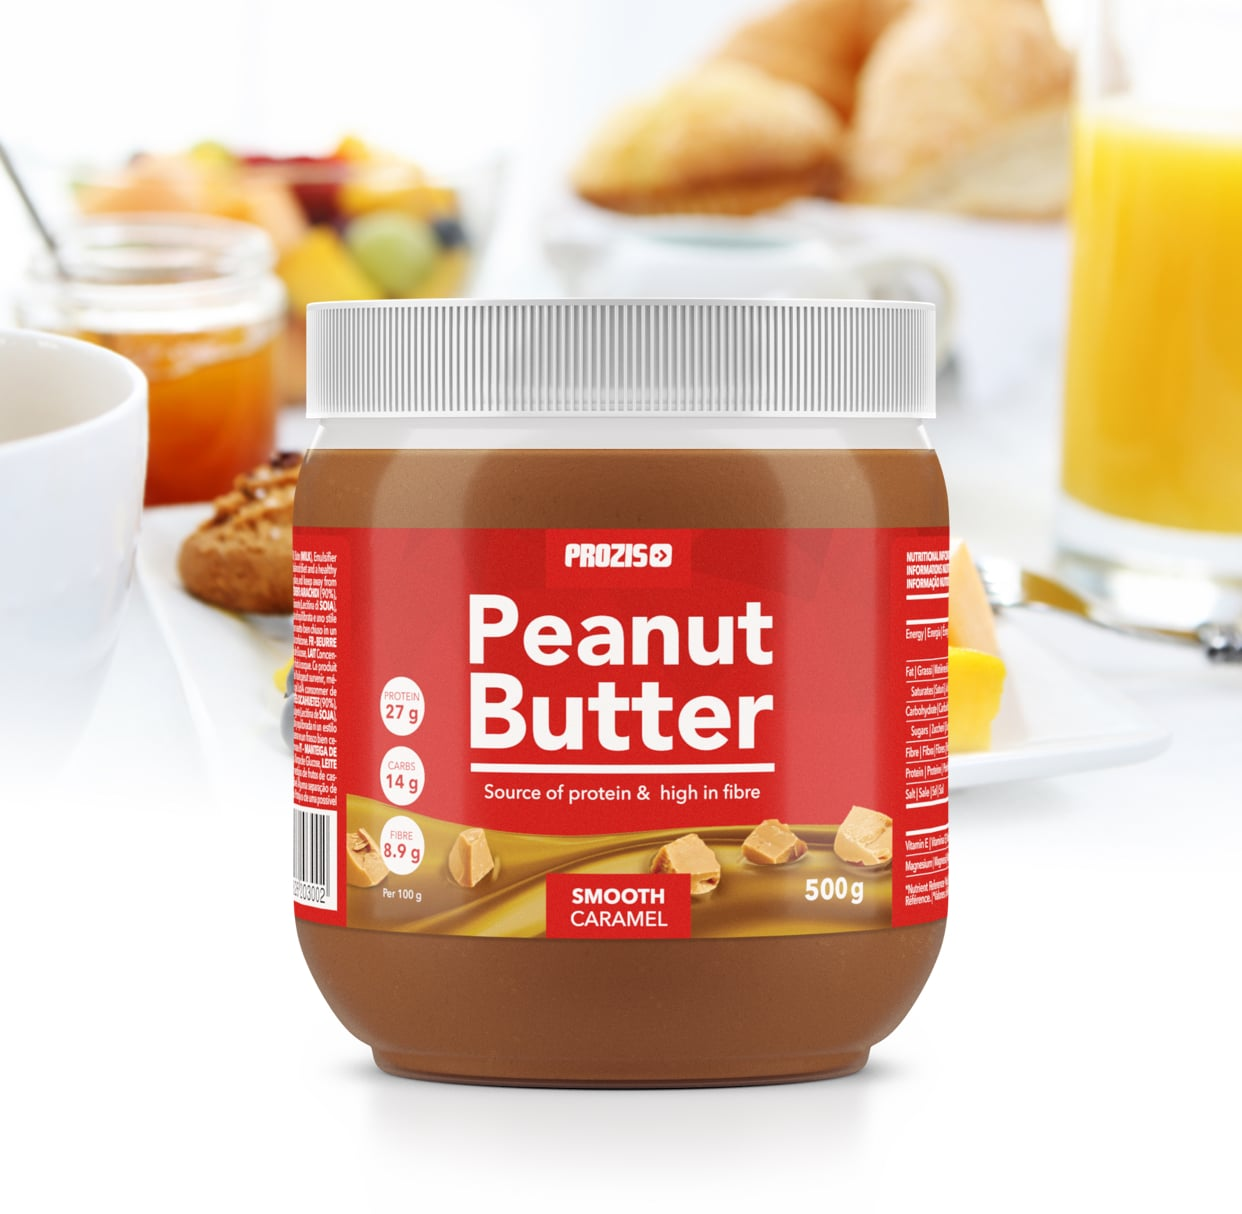 Prozis Peanut Caramel Butter